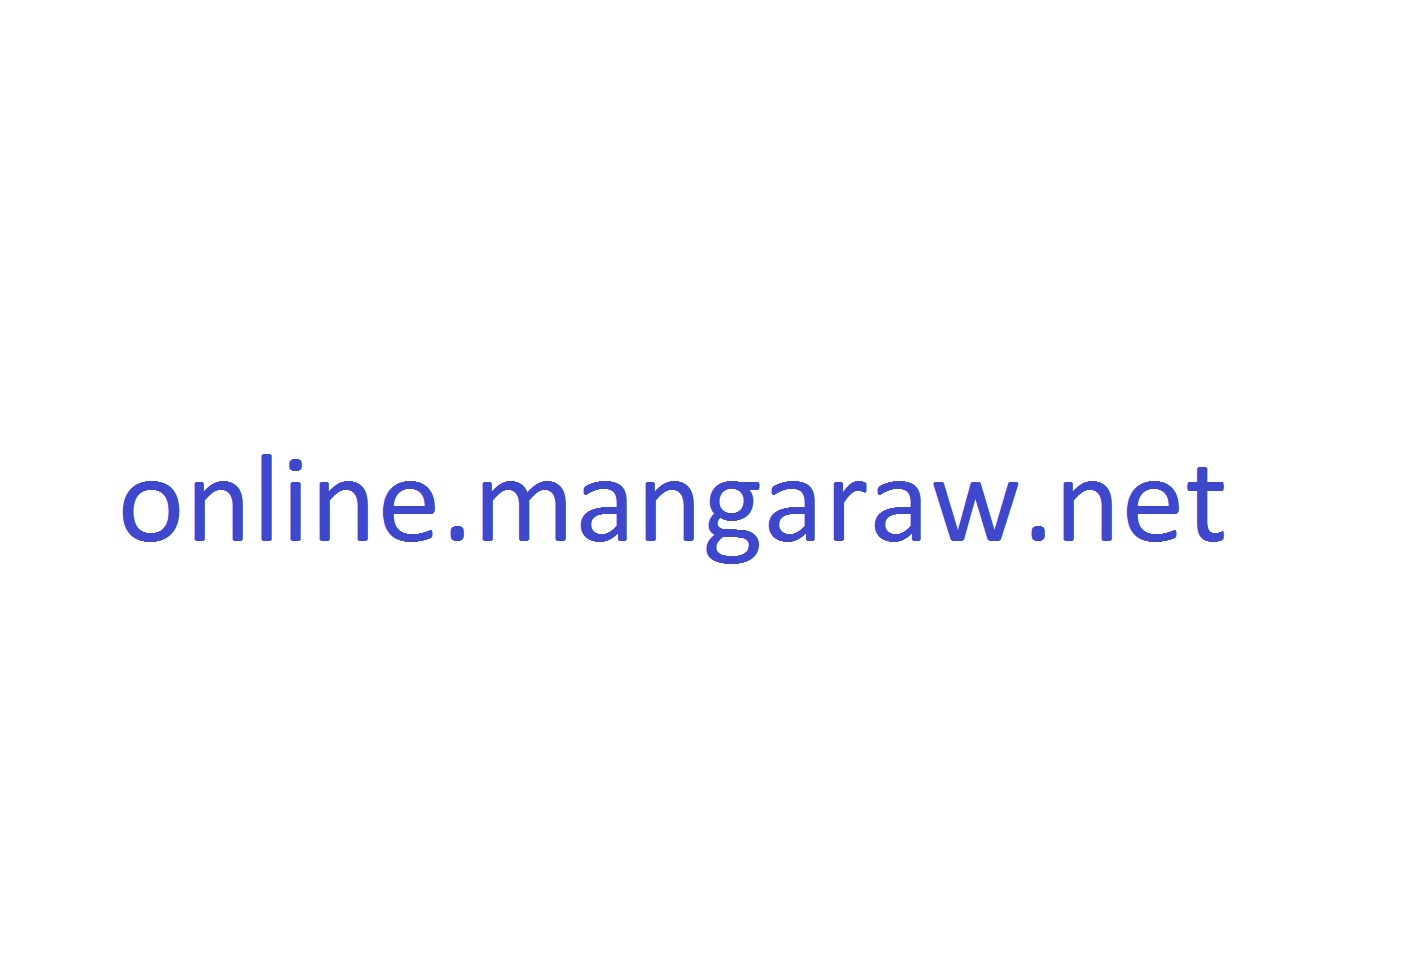 http://online.mangaraw.net/get/img/4/76812.jpg